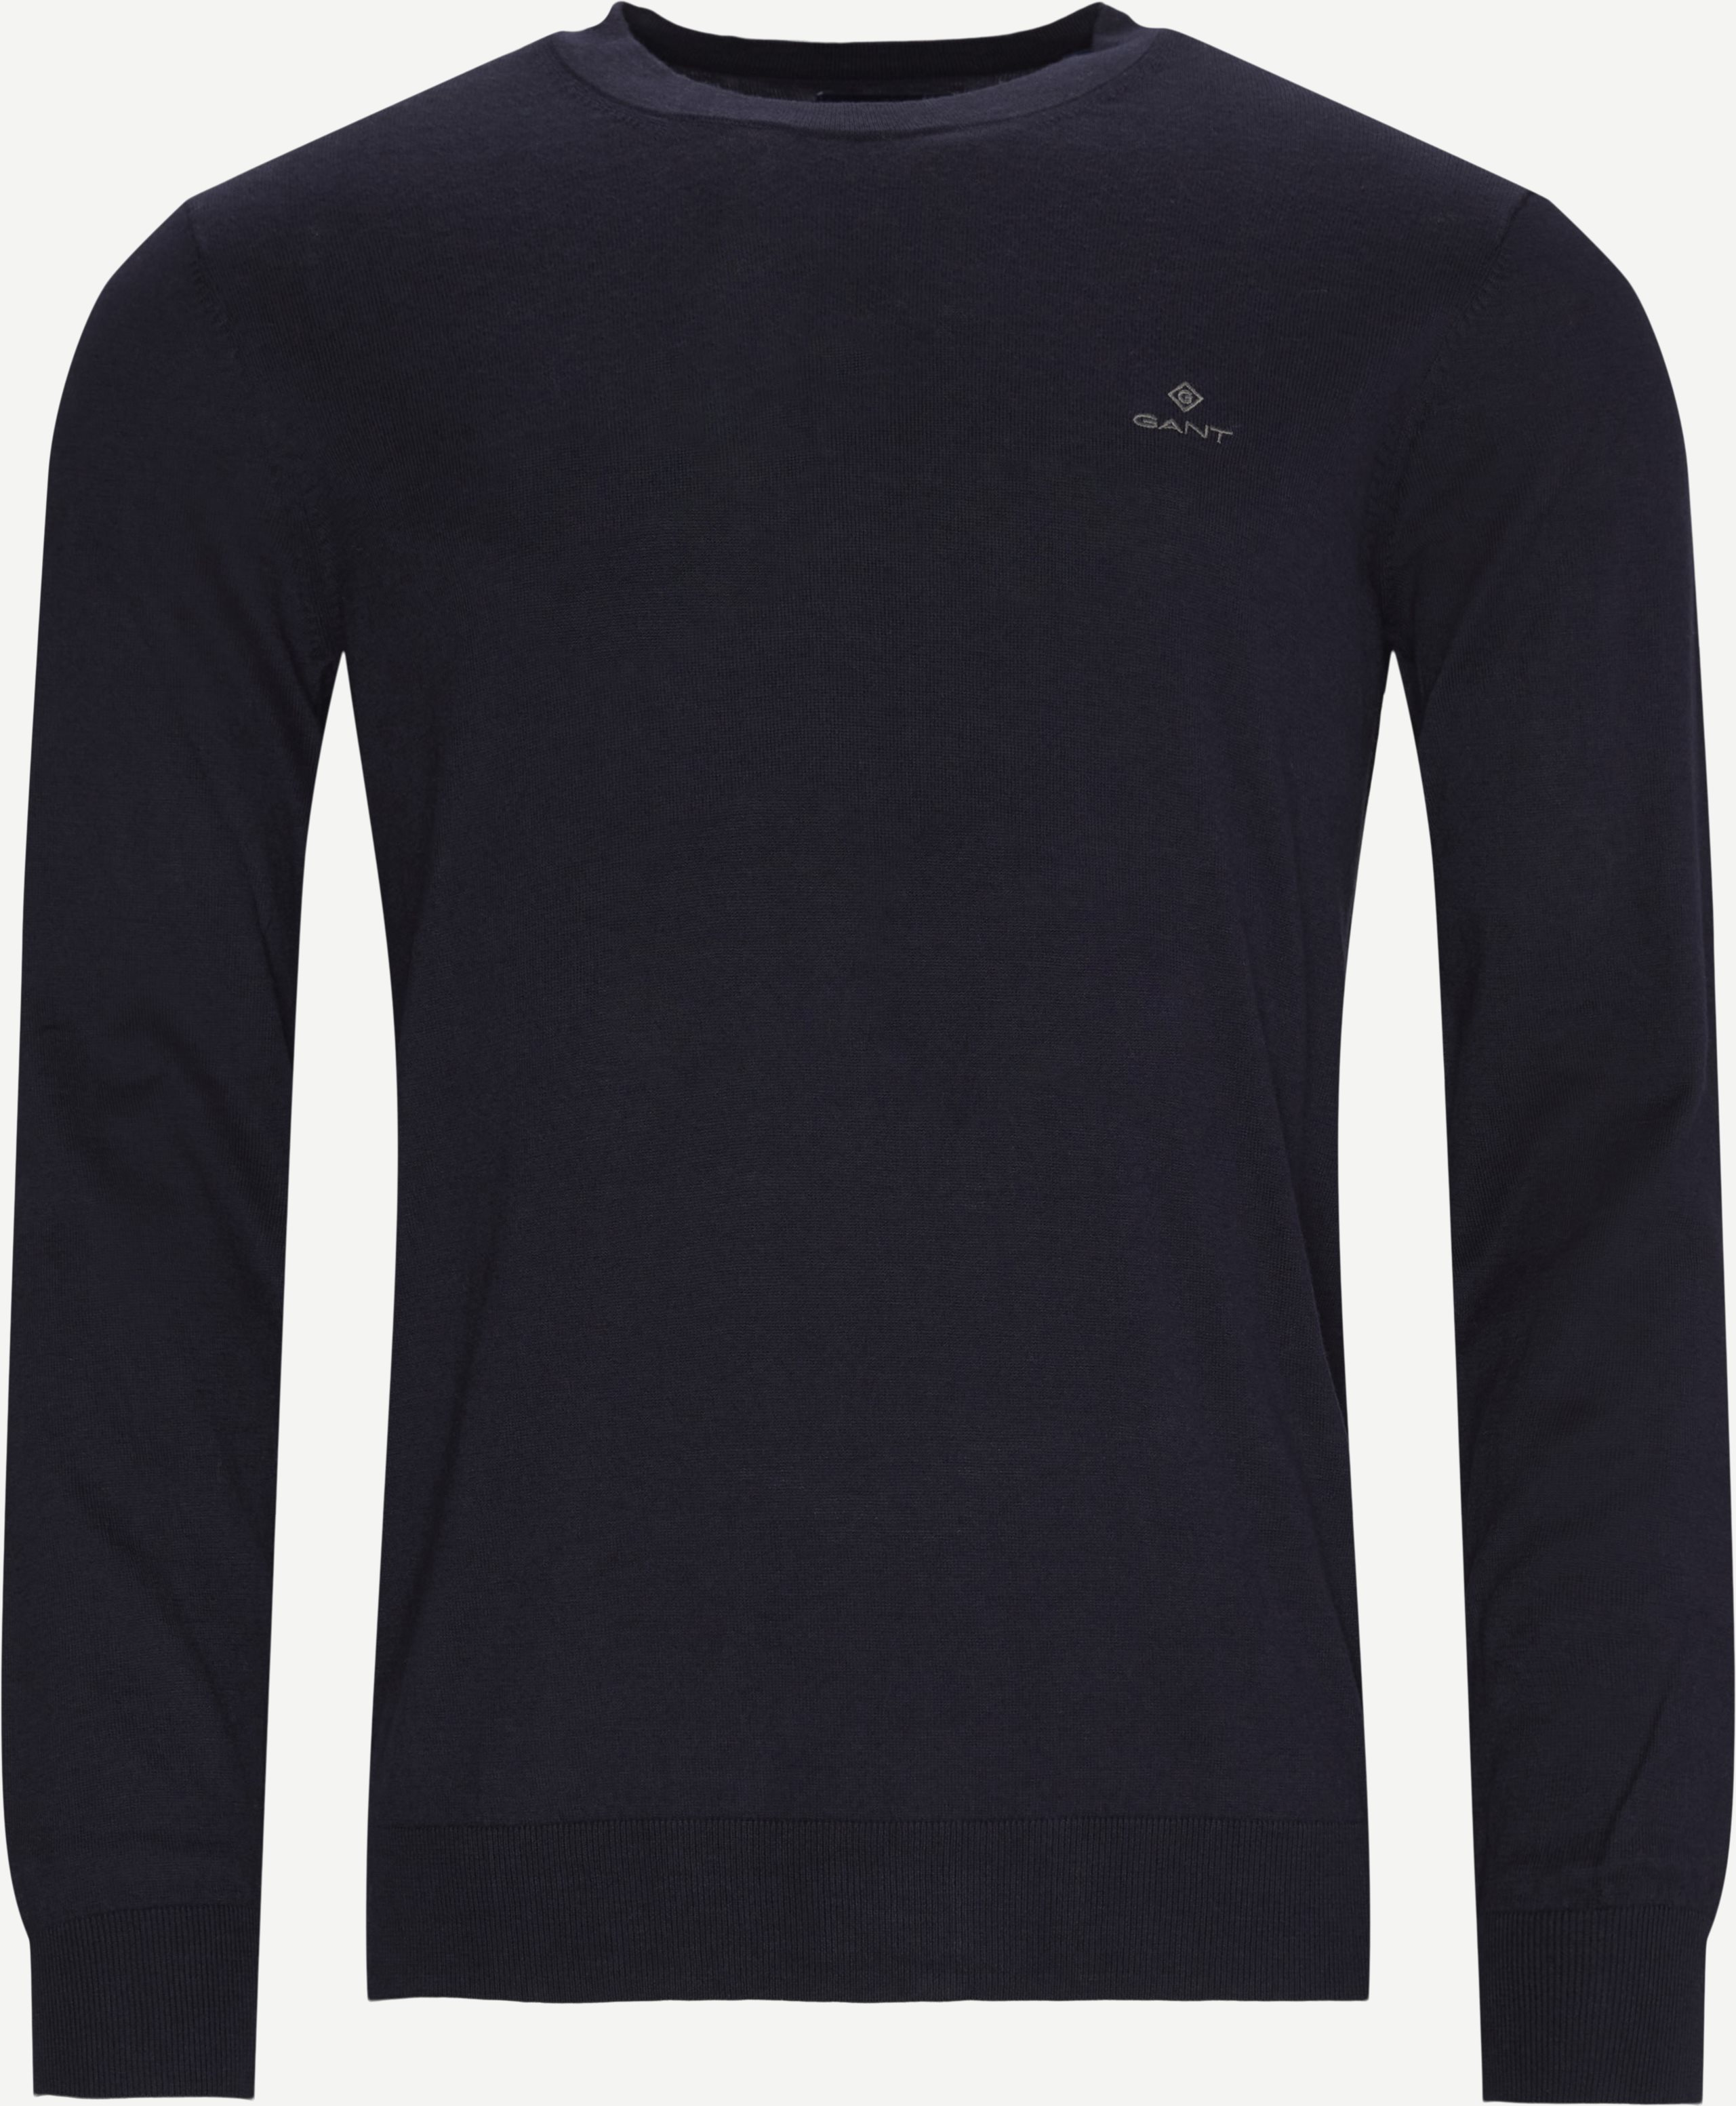 Crewneck sweatshirts - Regular - Blå